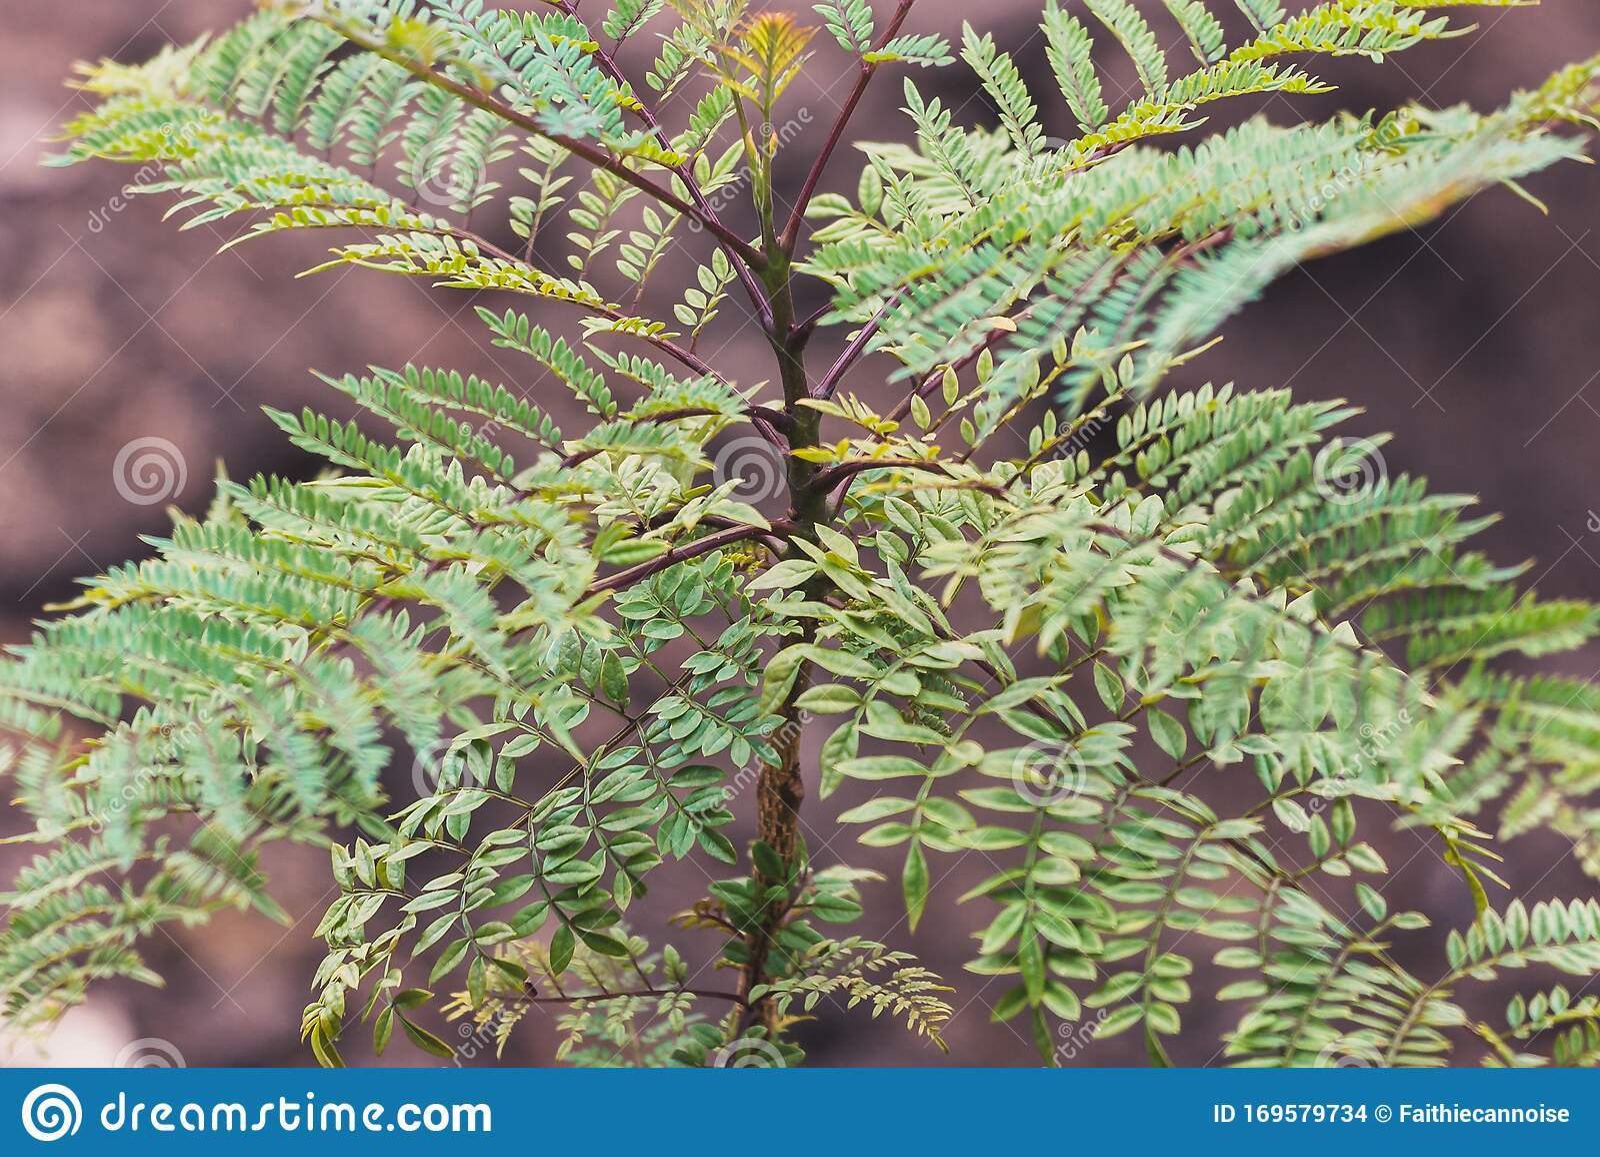 Small Jacaranda Tree Branch With Tiny Leaves Stock Photo Image Of Tropical Backyard